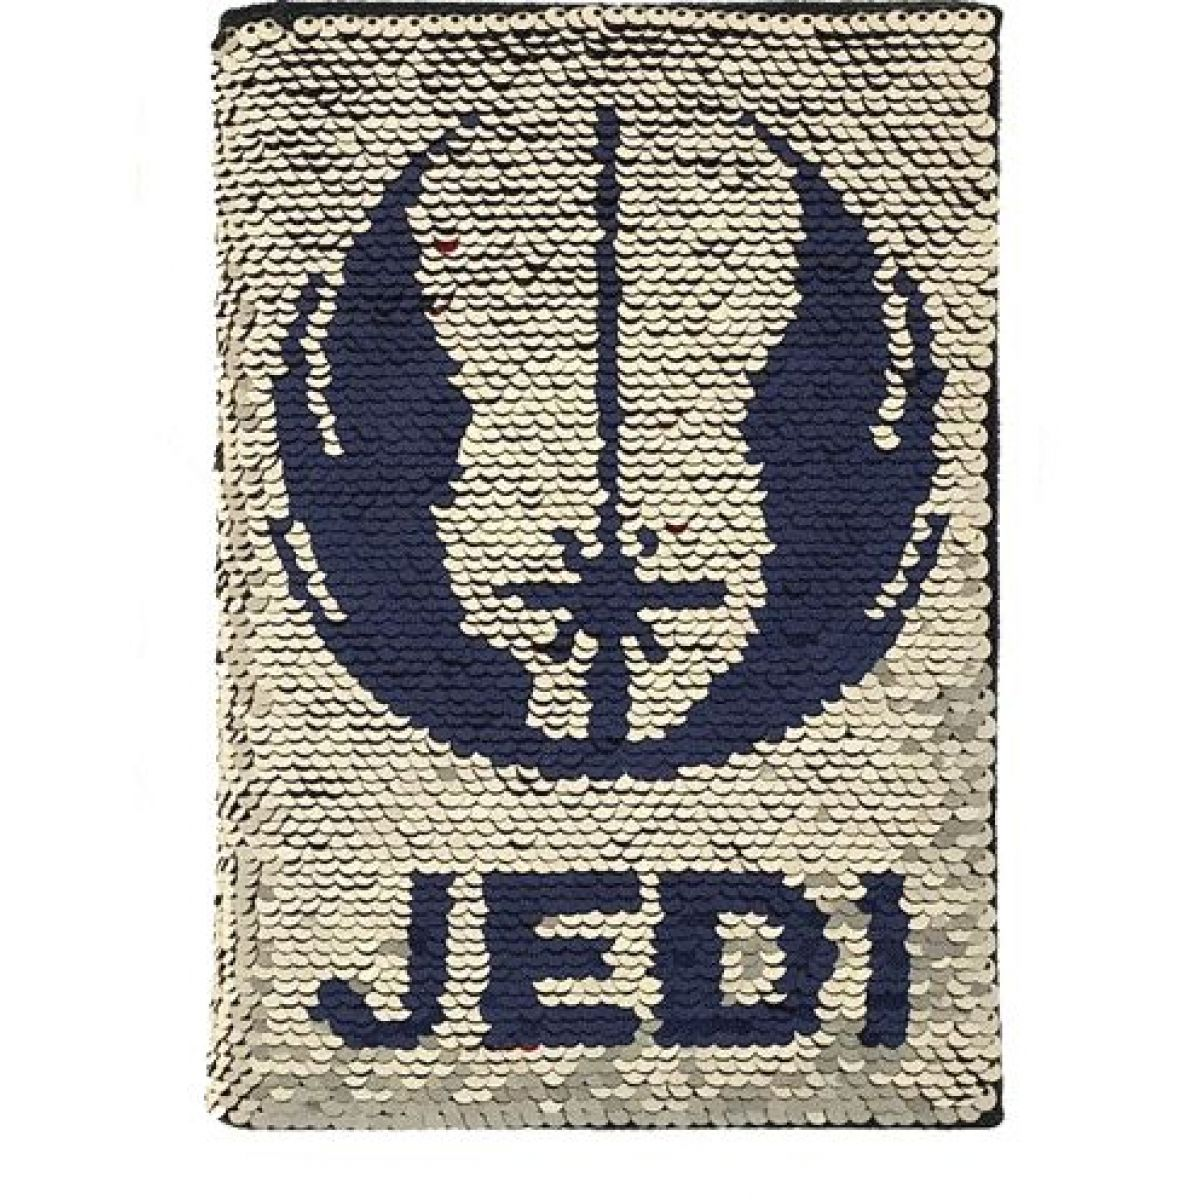 Zápisník A5 premium Star Wars The Rise of Skywalker